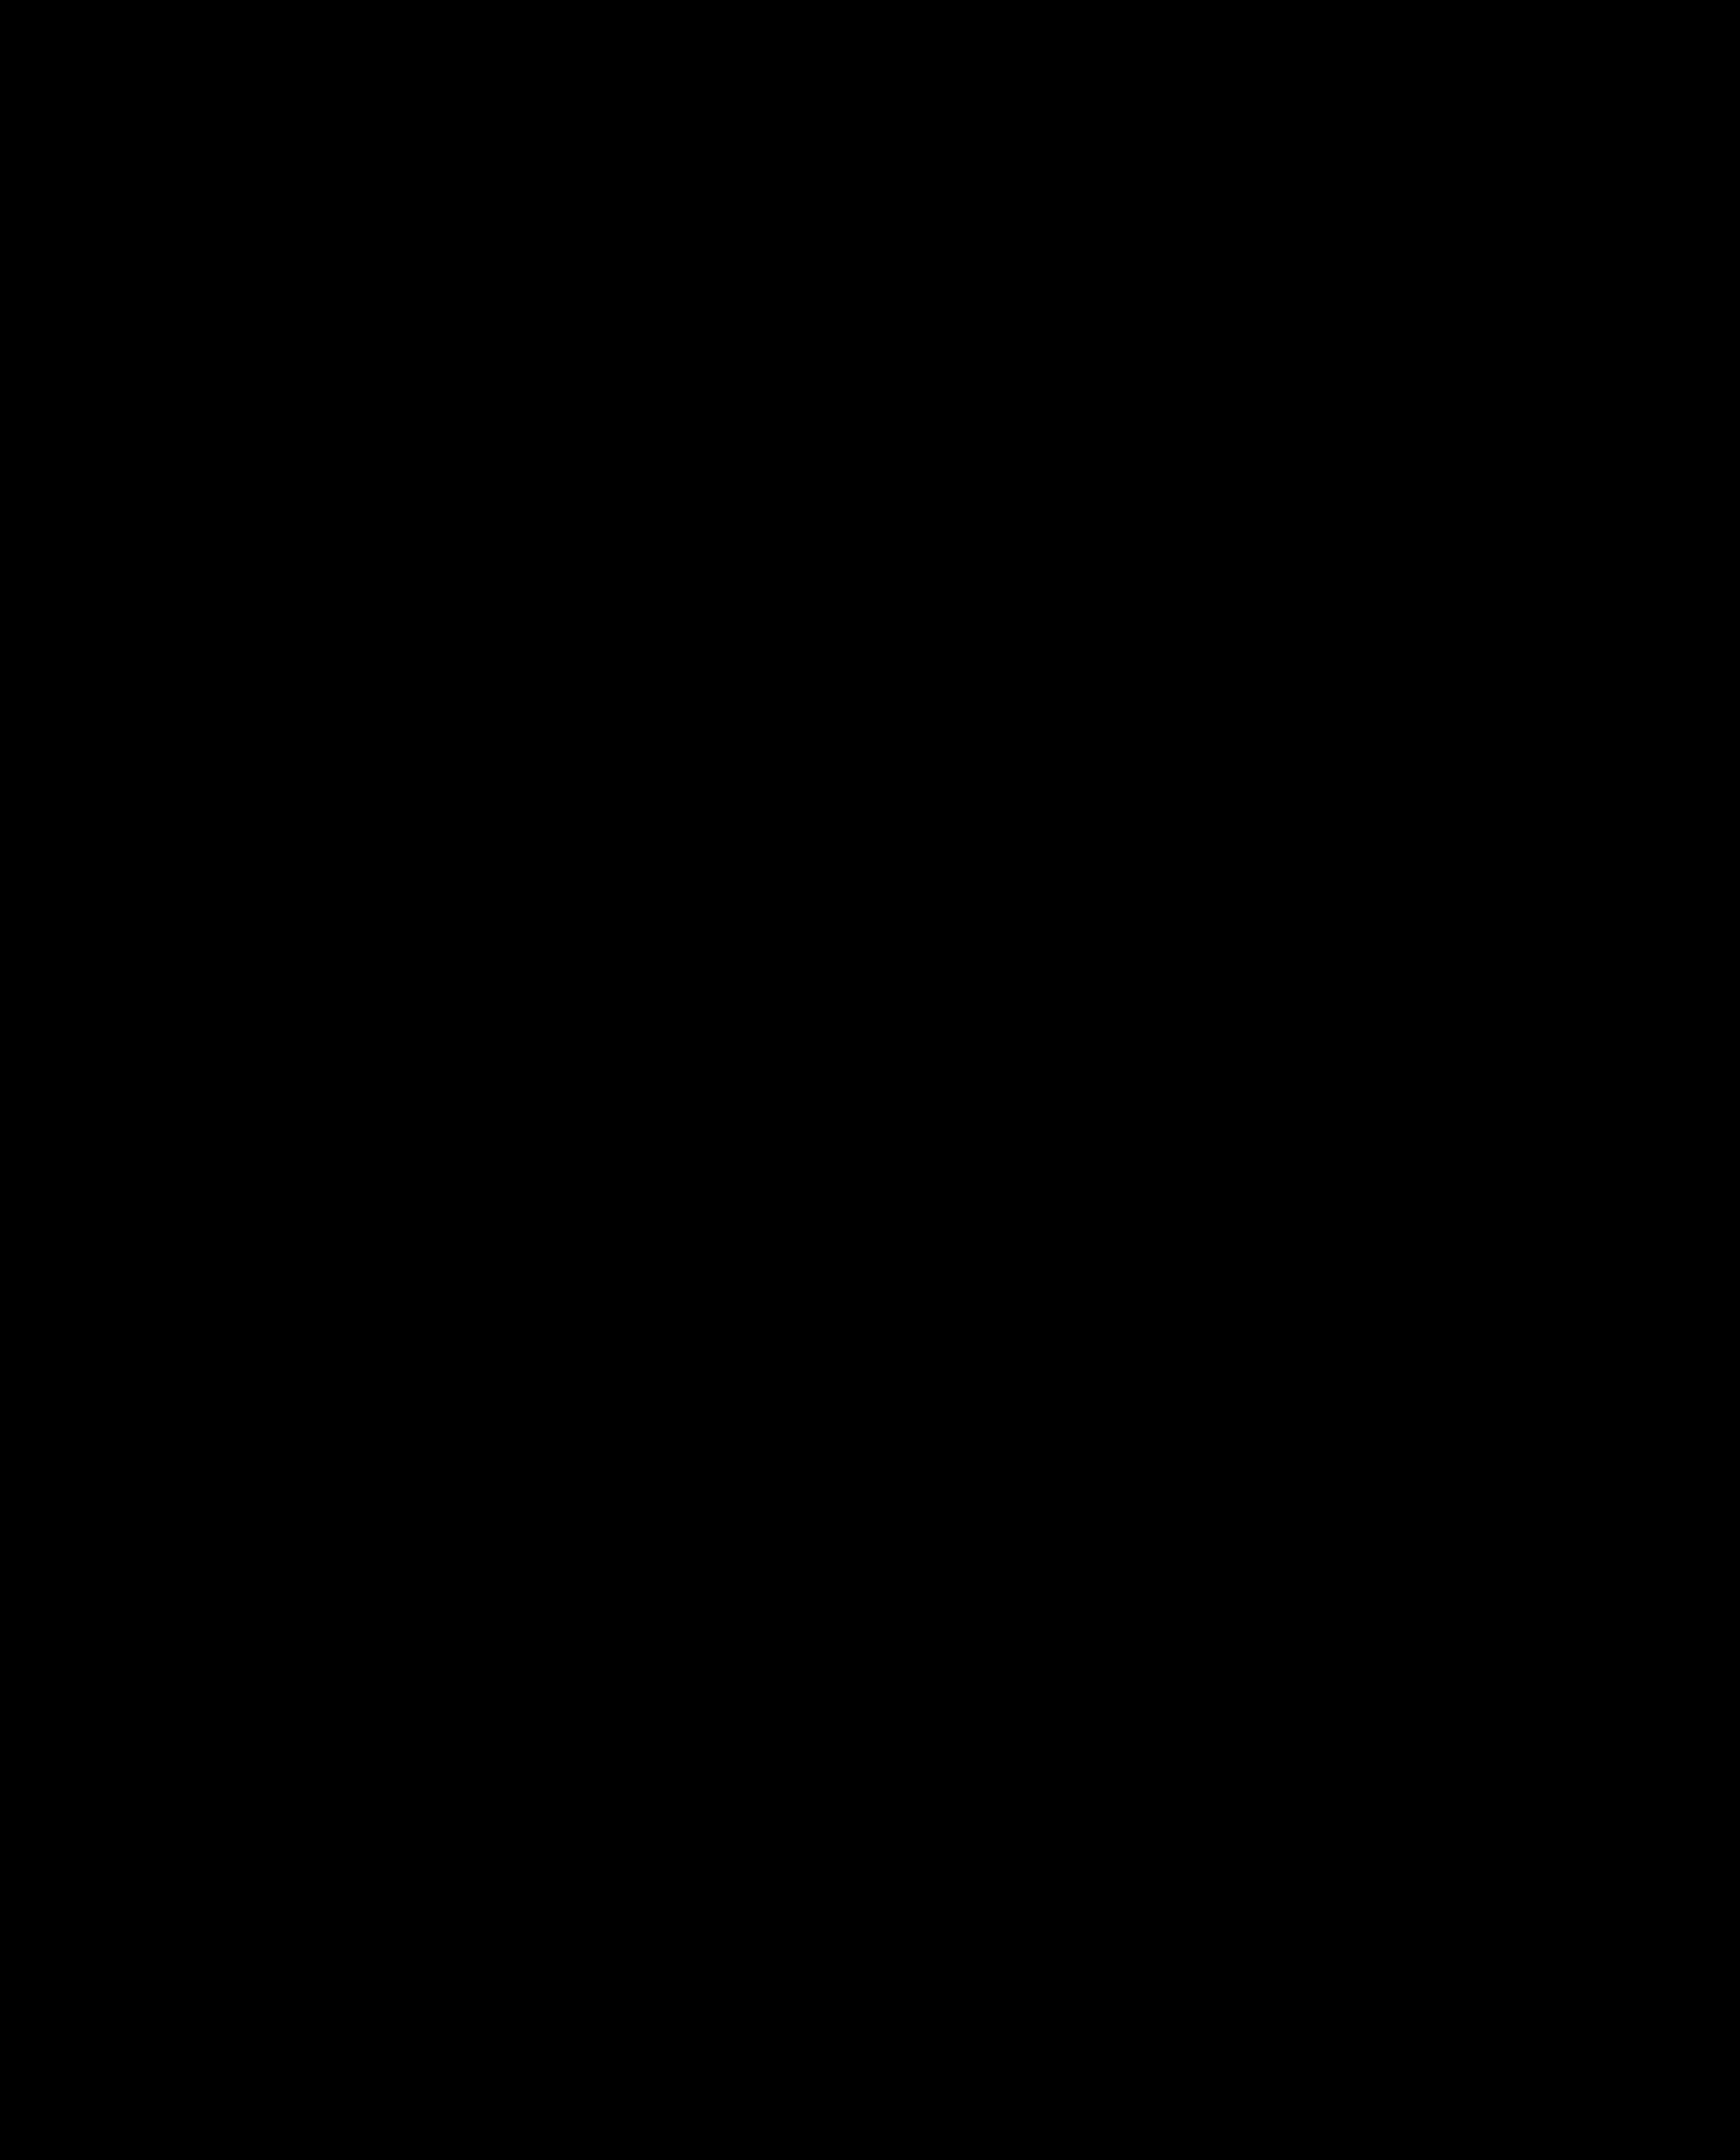 3827x4754 Image Of Blue Sailboat Clipart Boat Clip Art